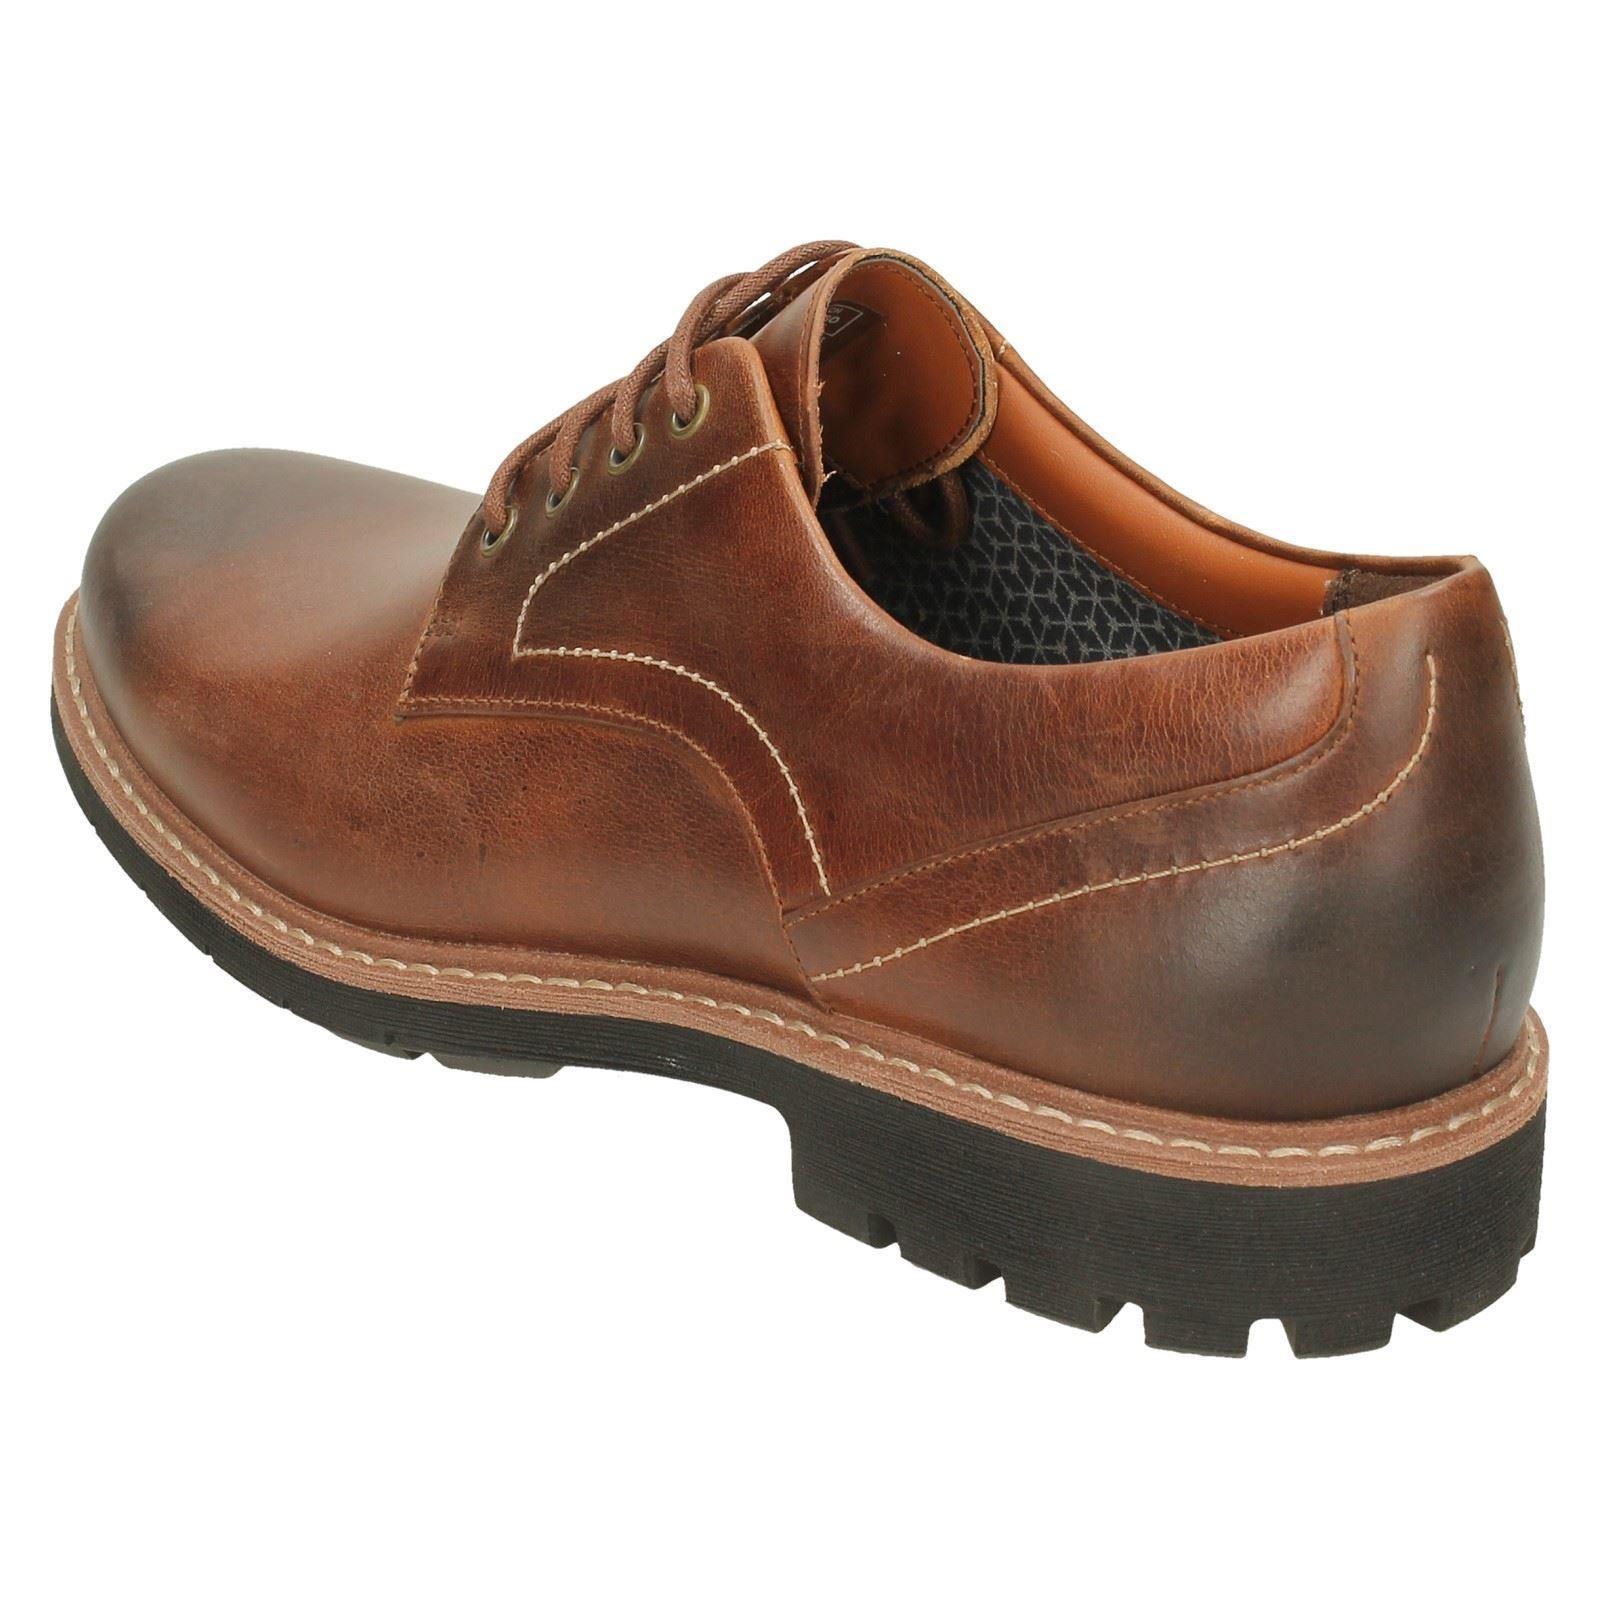 ... Herren Schuhe Clarks Intelligente Spitzen Sich Schuhe Herren  Batcombe  Hall  b38ce9 ... cba6076fd6